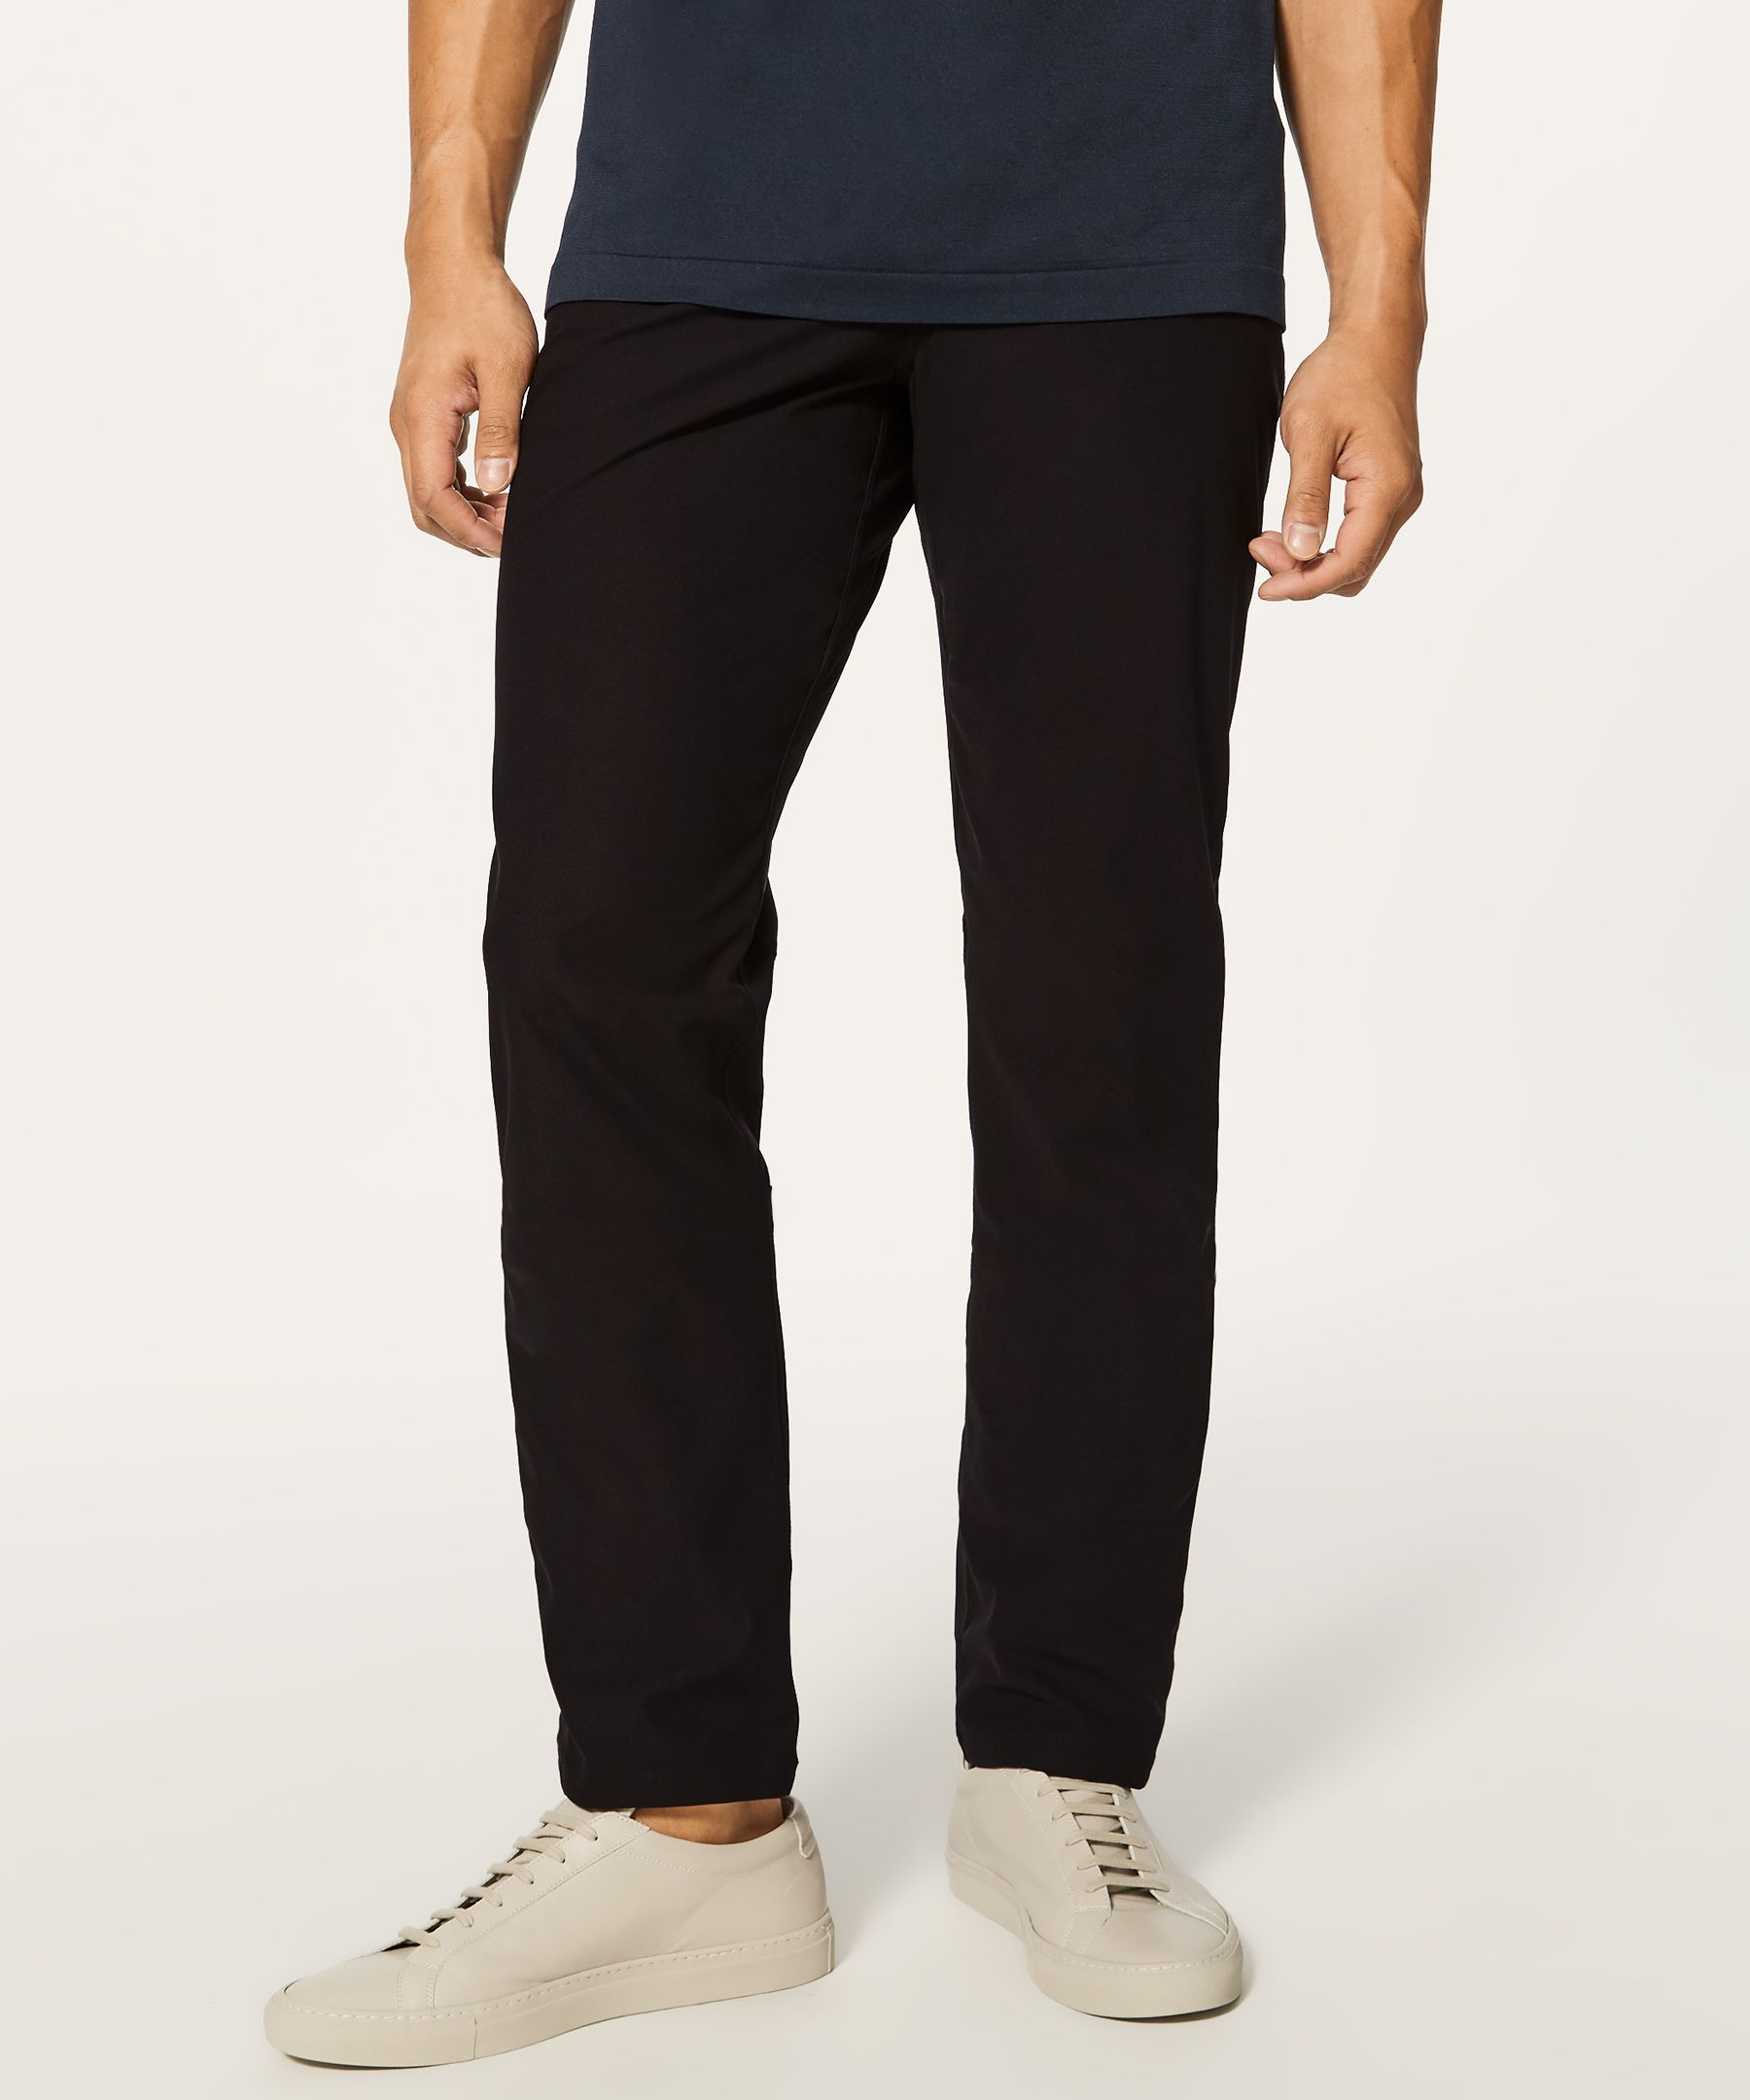 "ABC Pant (Regular) *34"" | Men's Pants | lululemon athletica"